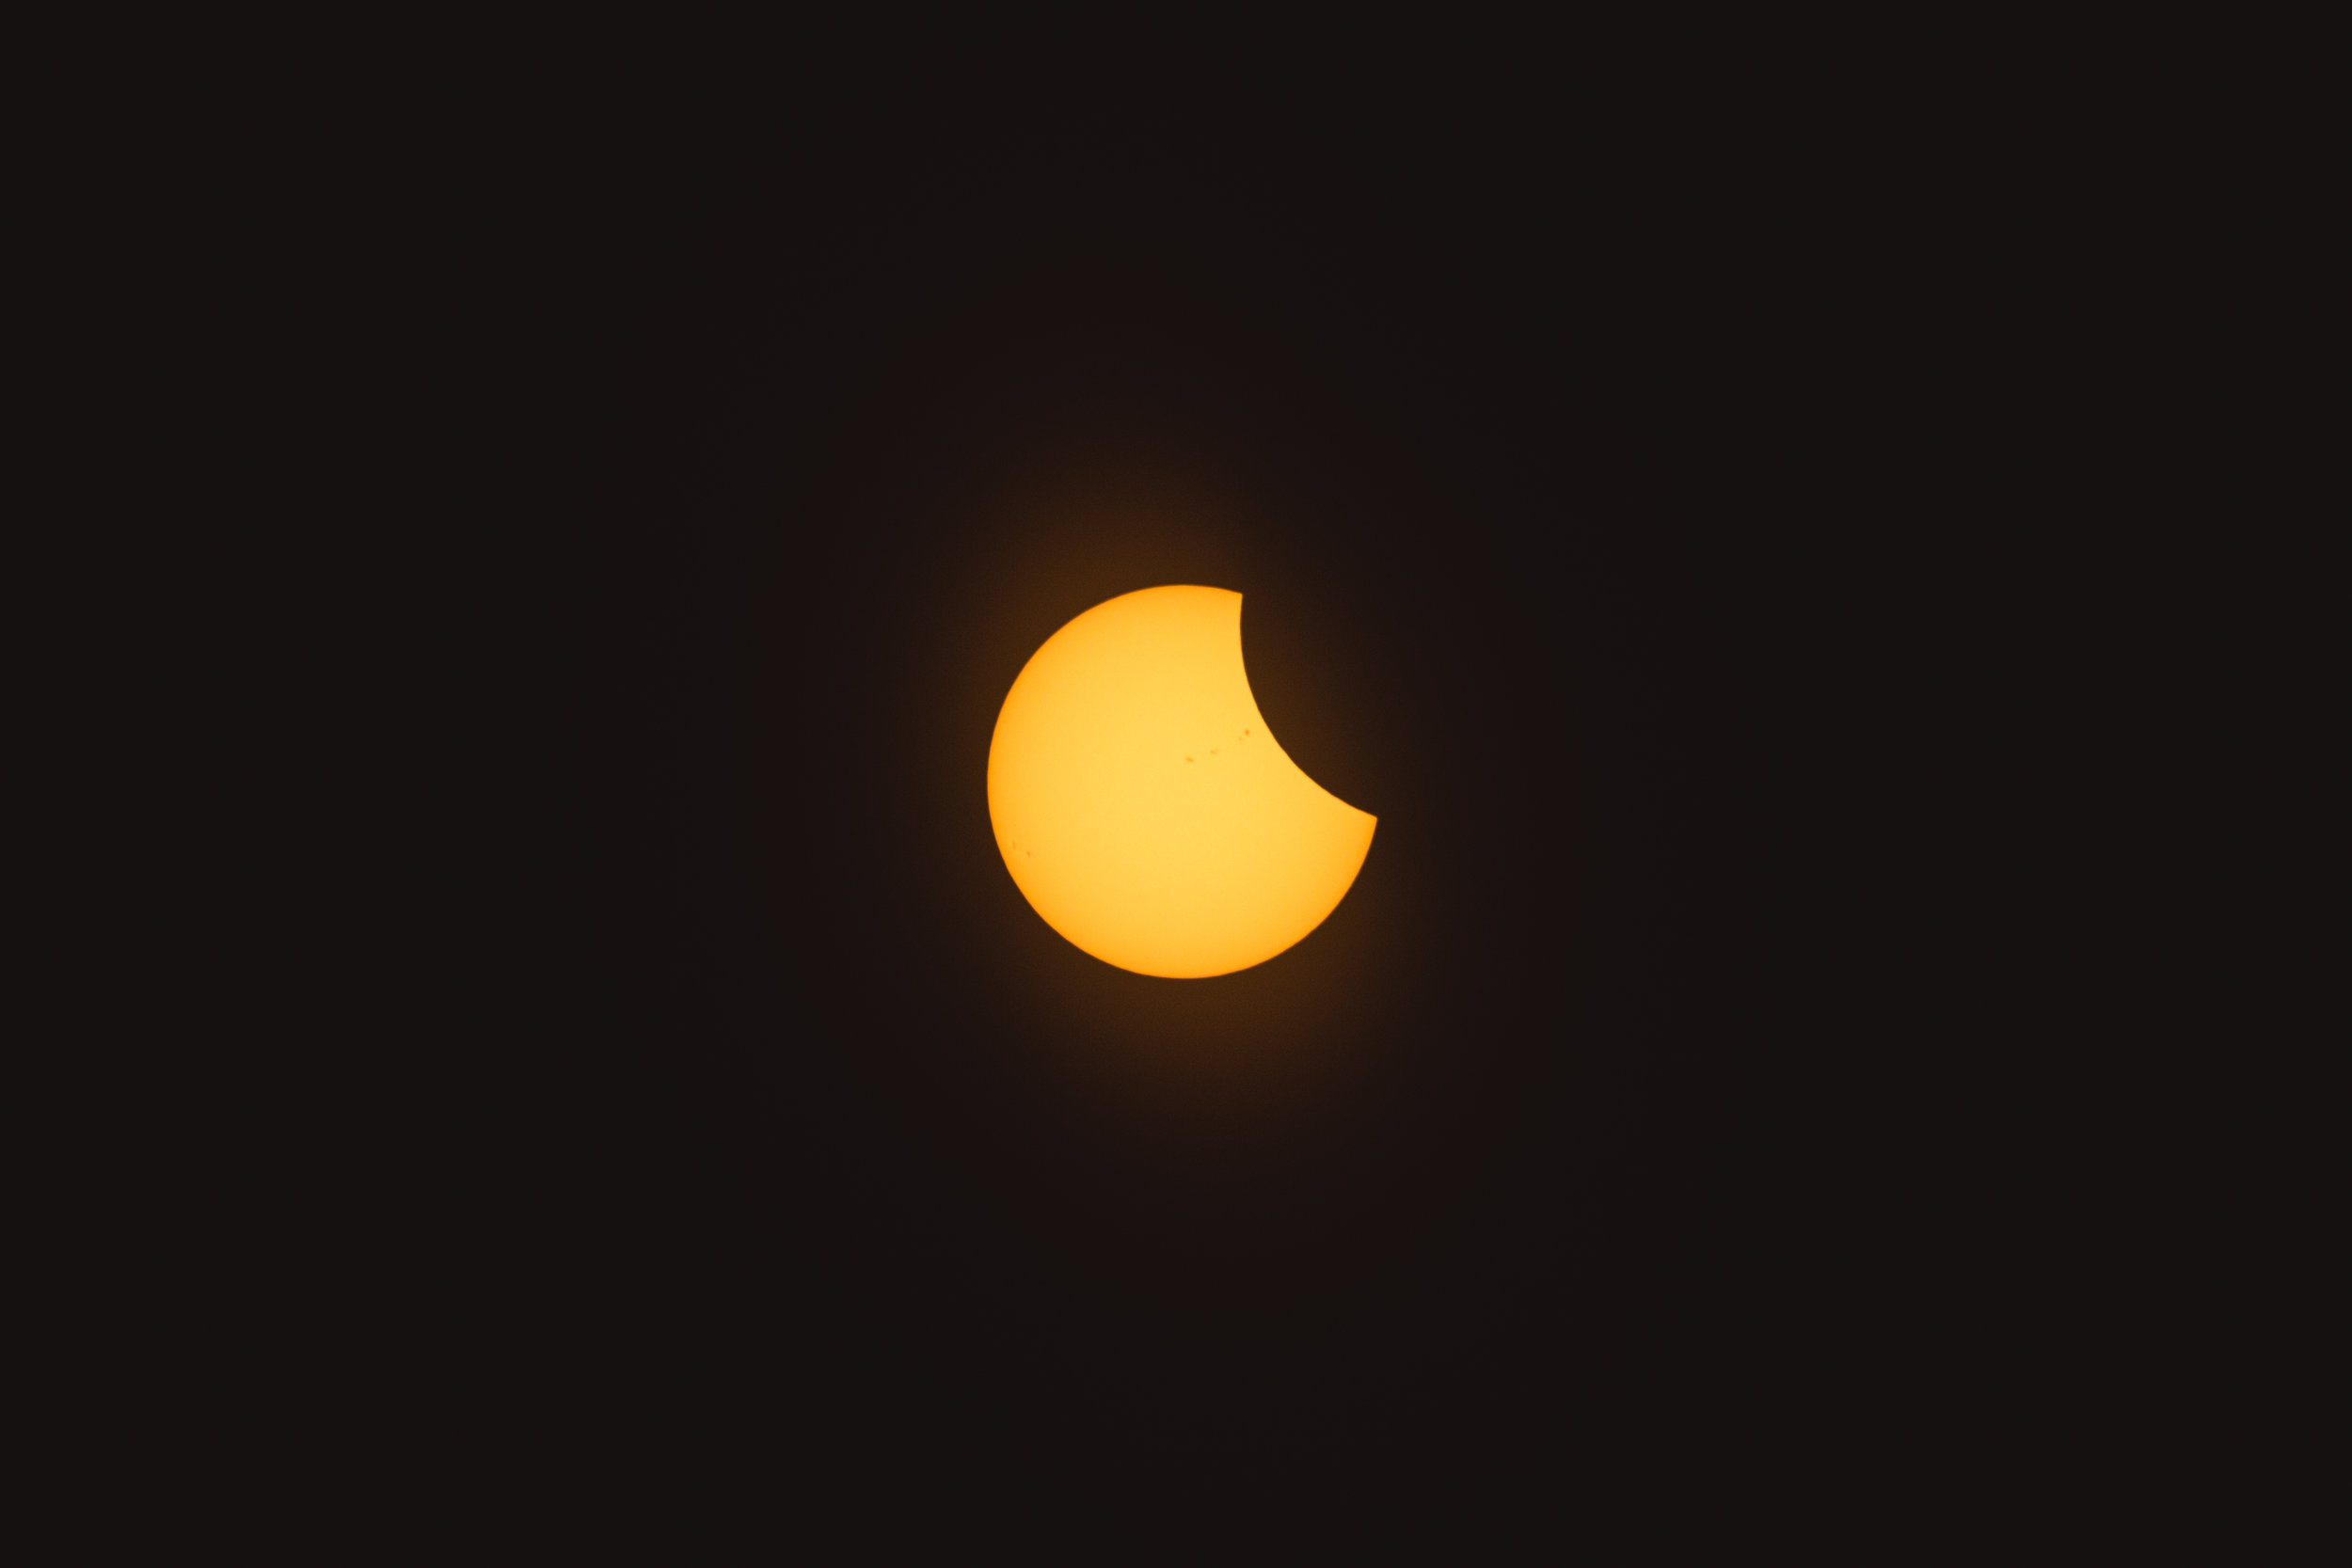 Eclipse (5 of 21).jpg